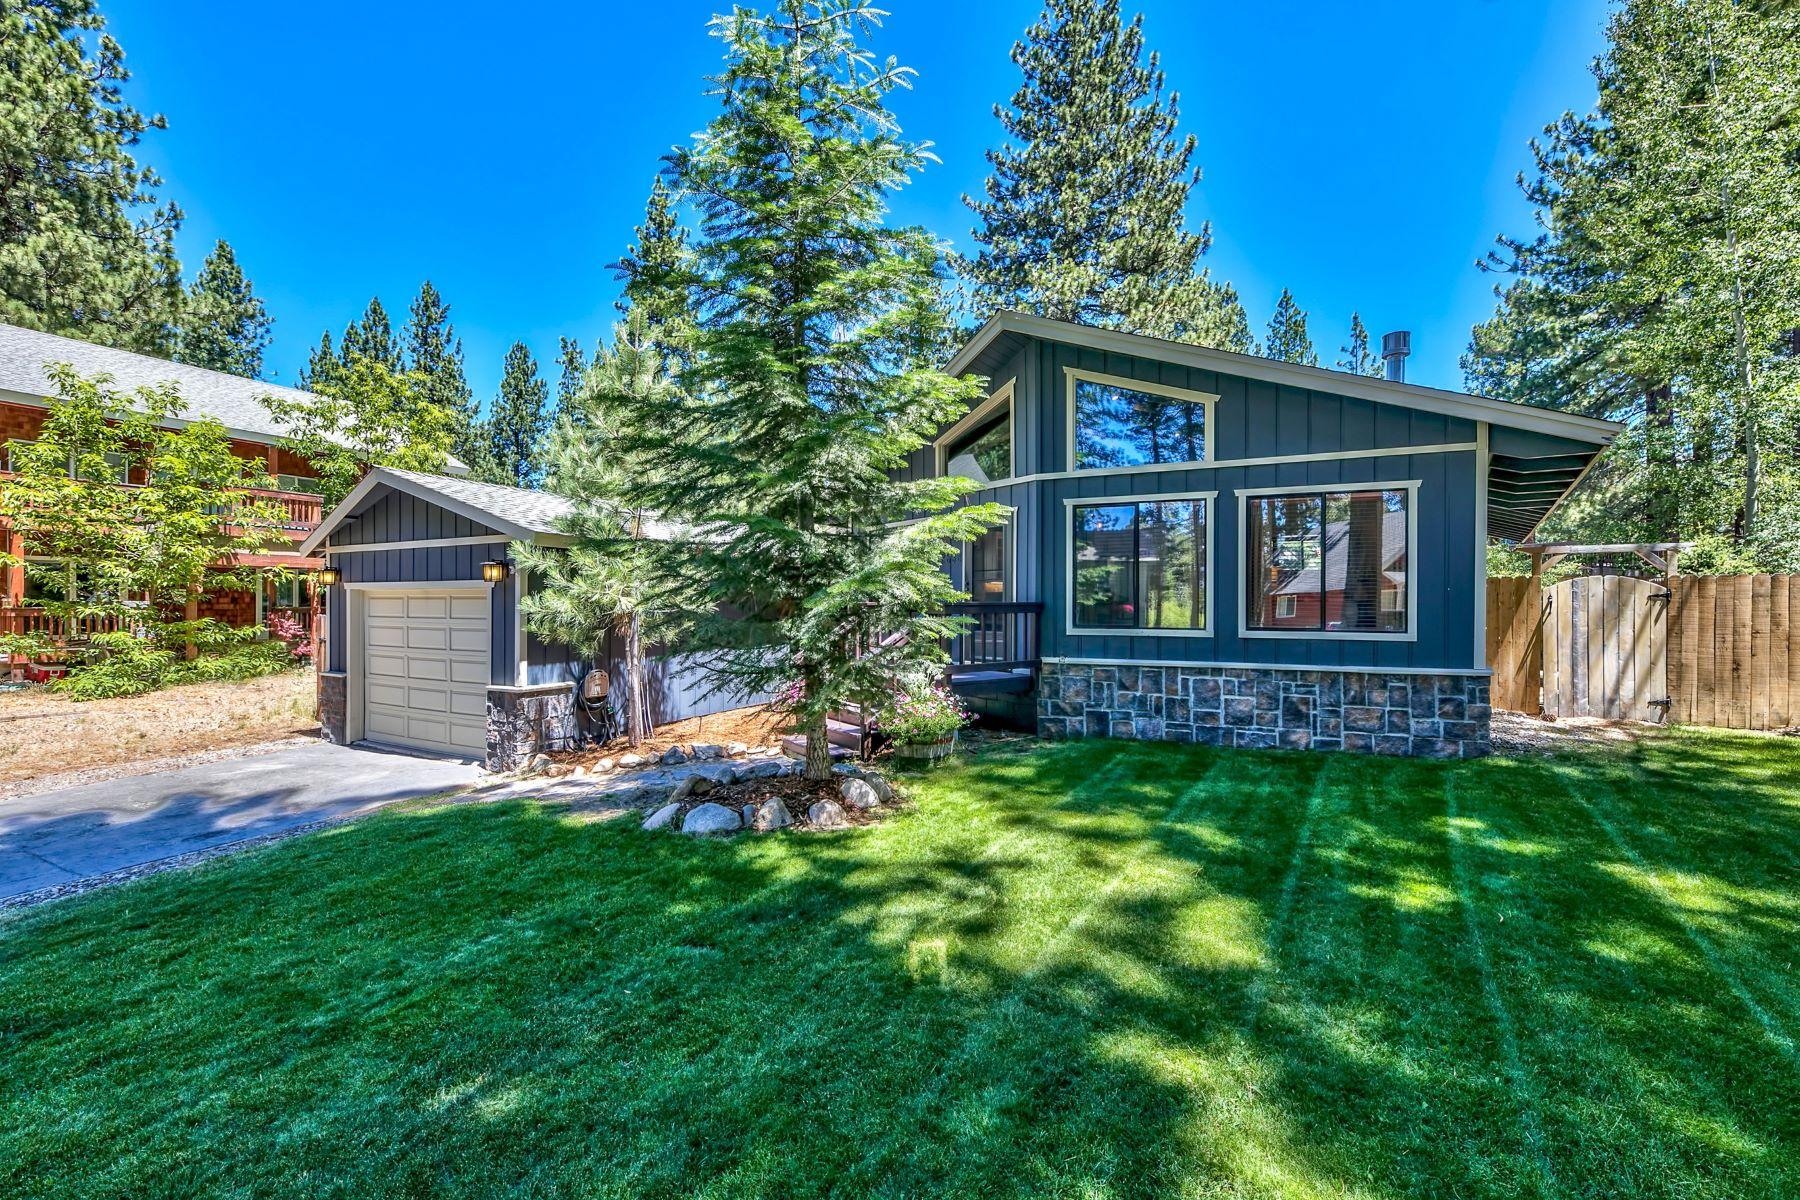 Single Family Homes 为 销售 在 2838 Springwood Drive, South Lake Tahoe, CA 96150 2838 Springwood Drive 南太浩湖, 加利福尼亚州 96150 美国